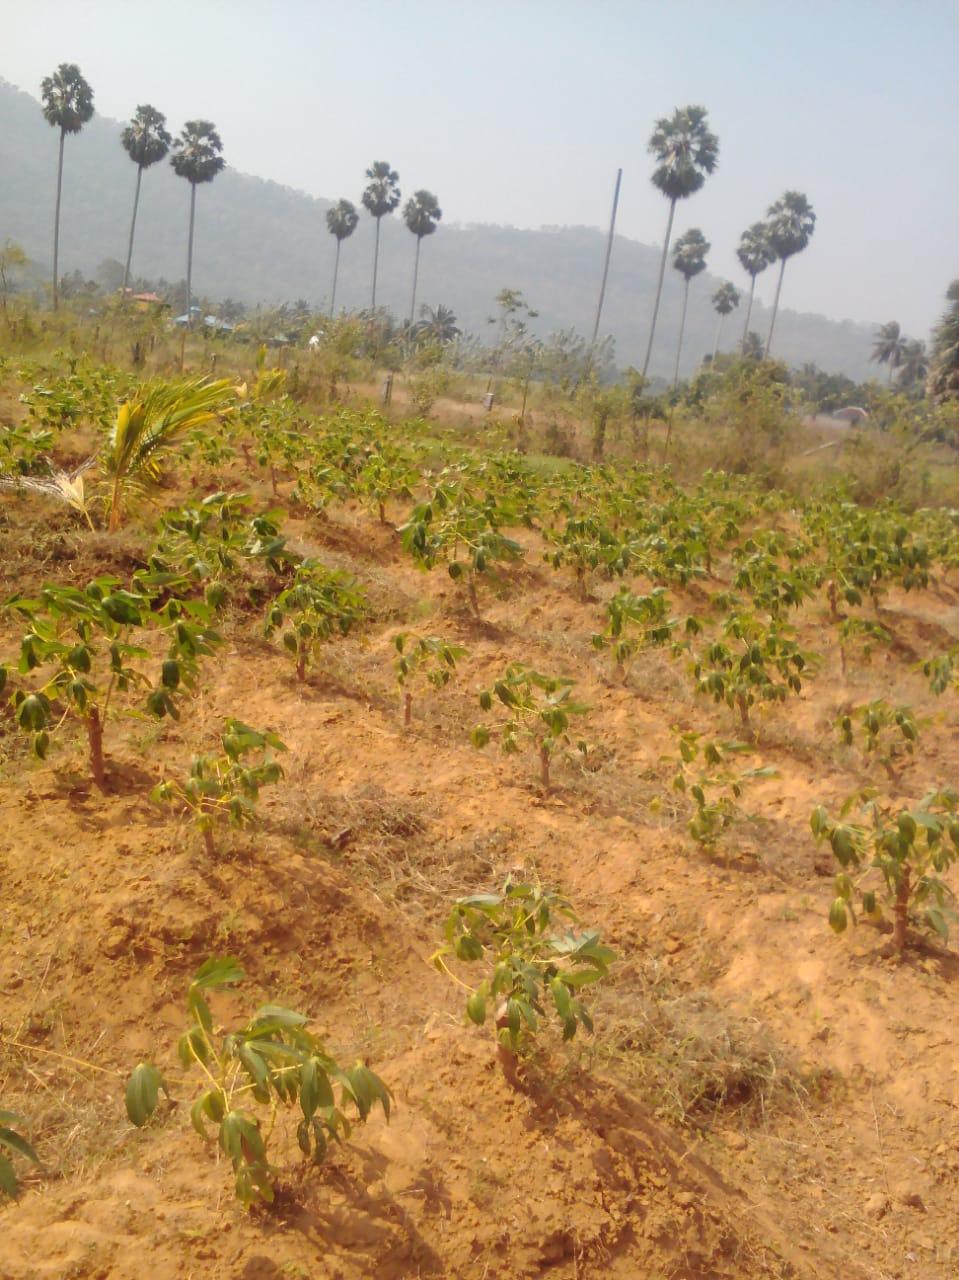 70 CENTS LAND FOR SALE NEAR POTHUNDI DAM, PALAKAD